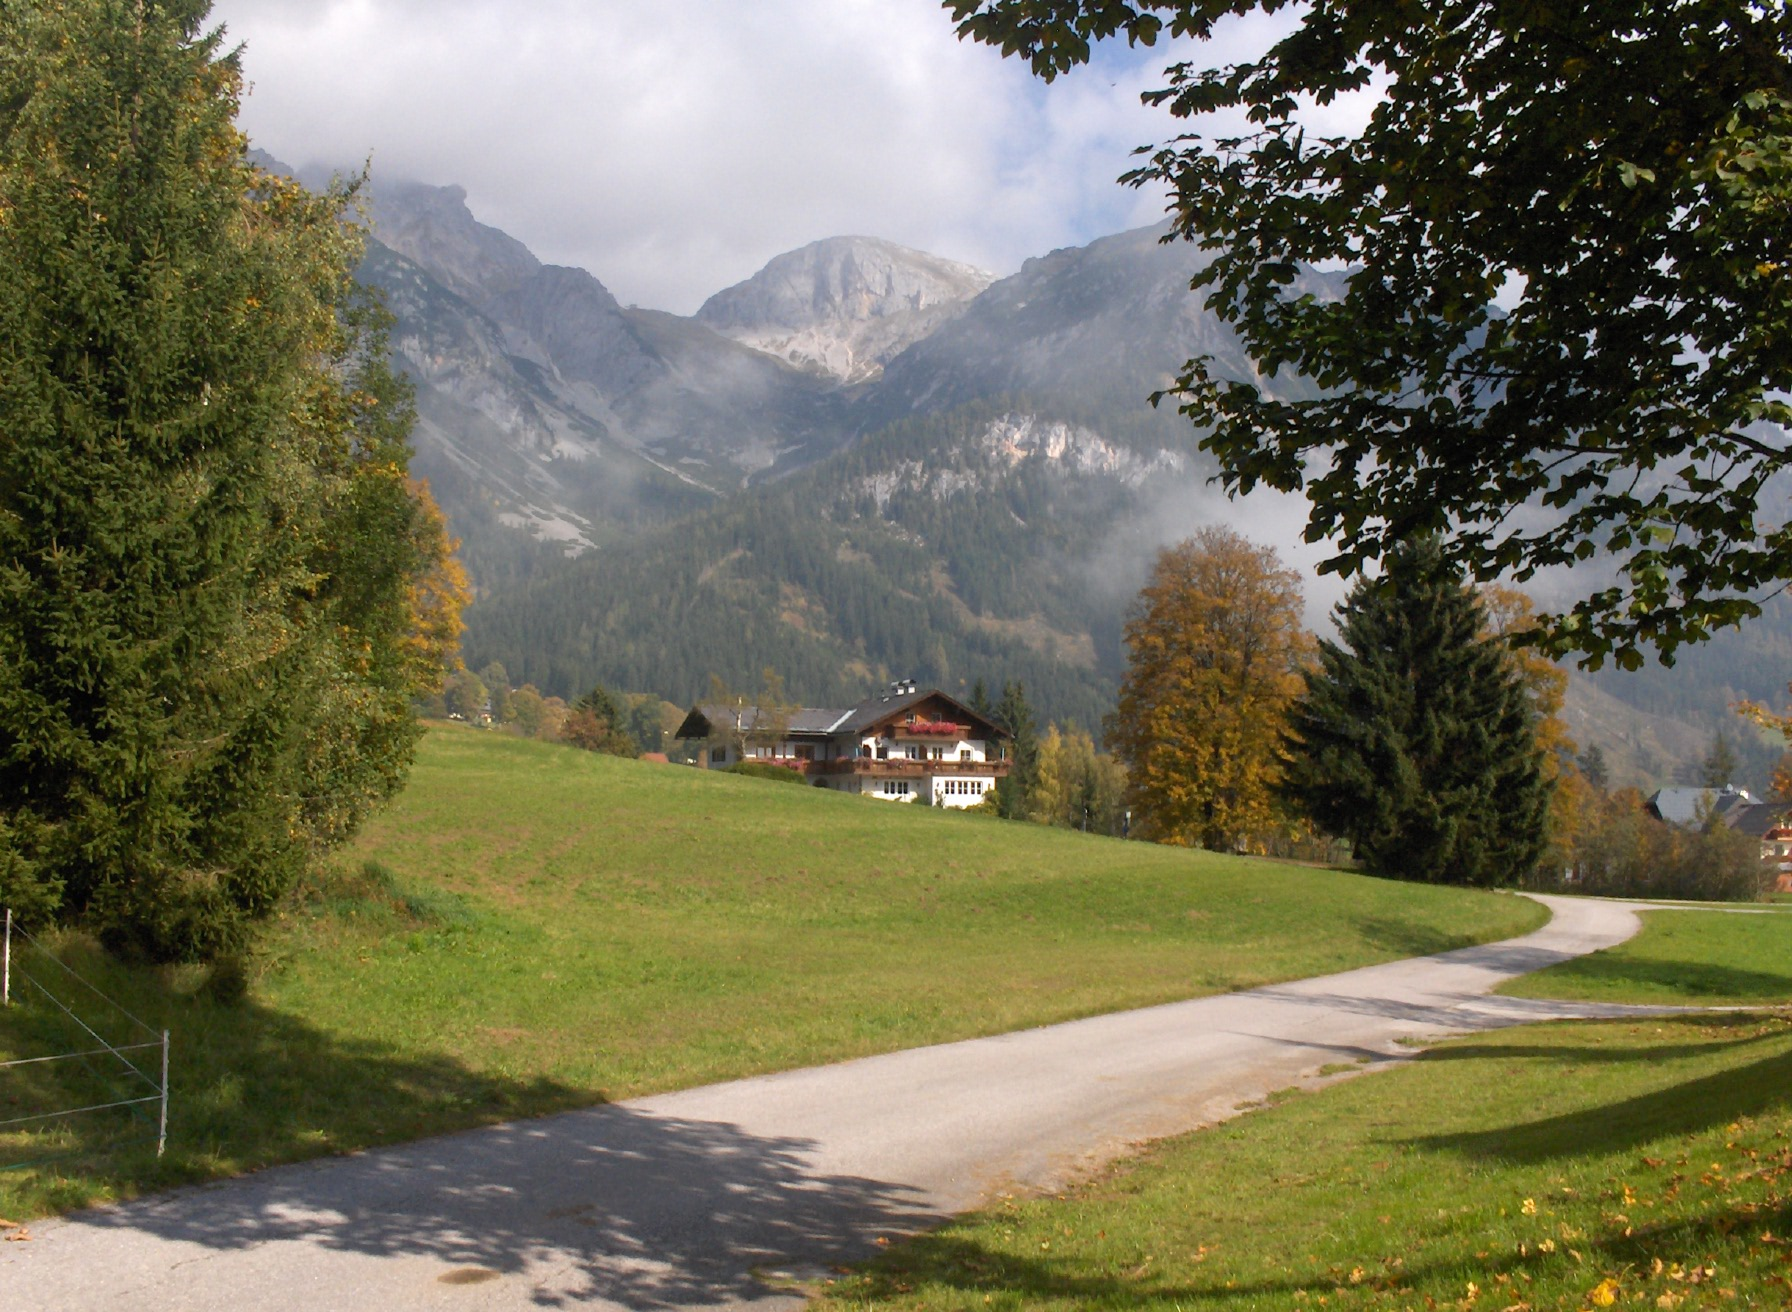 Haus Heidi in autumn